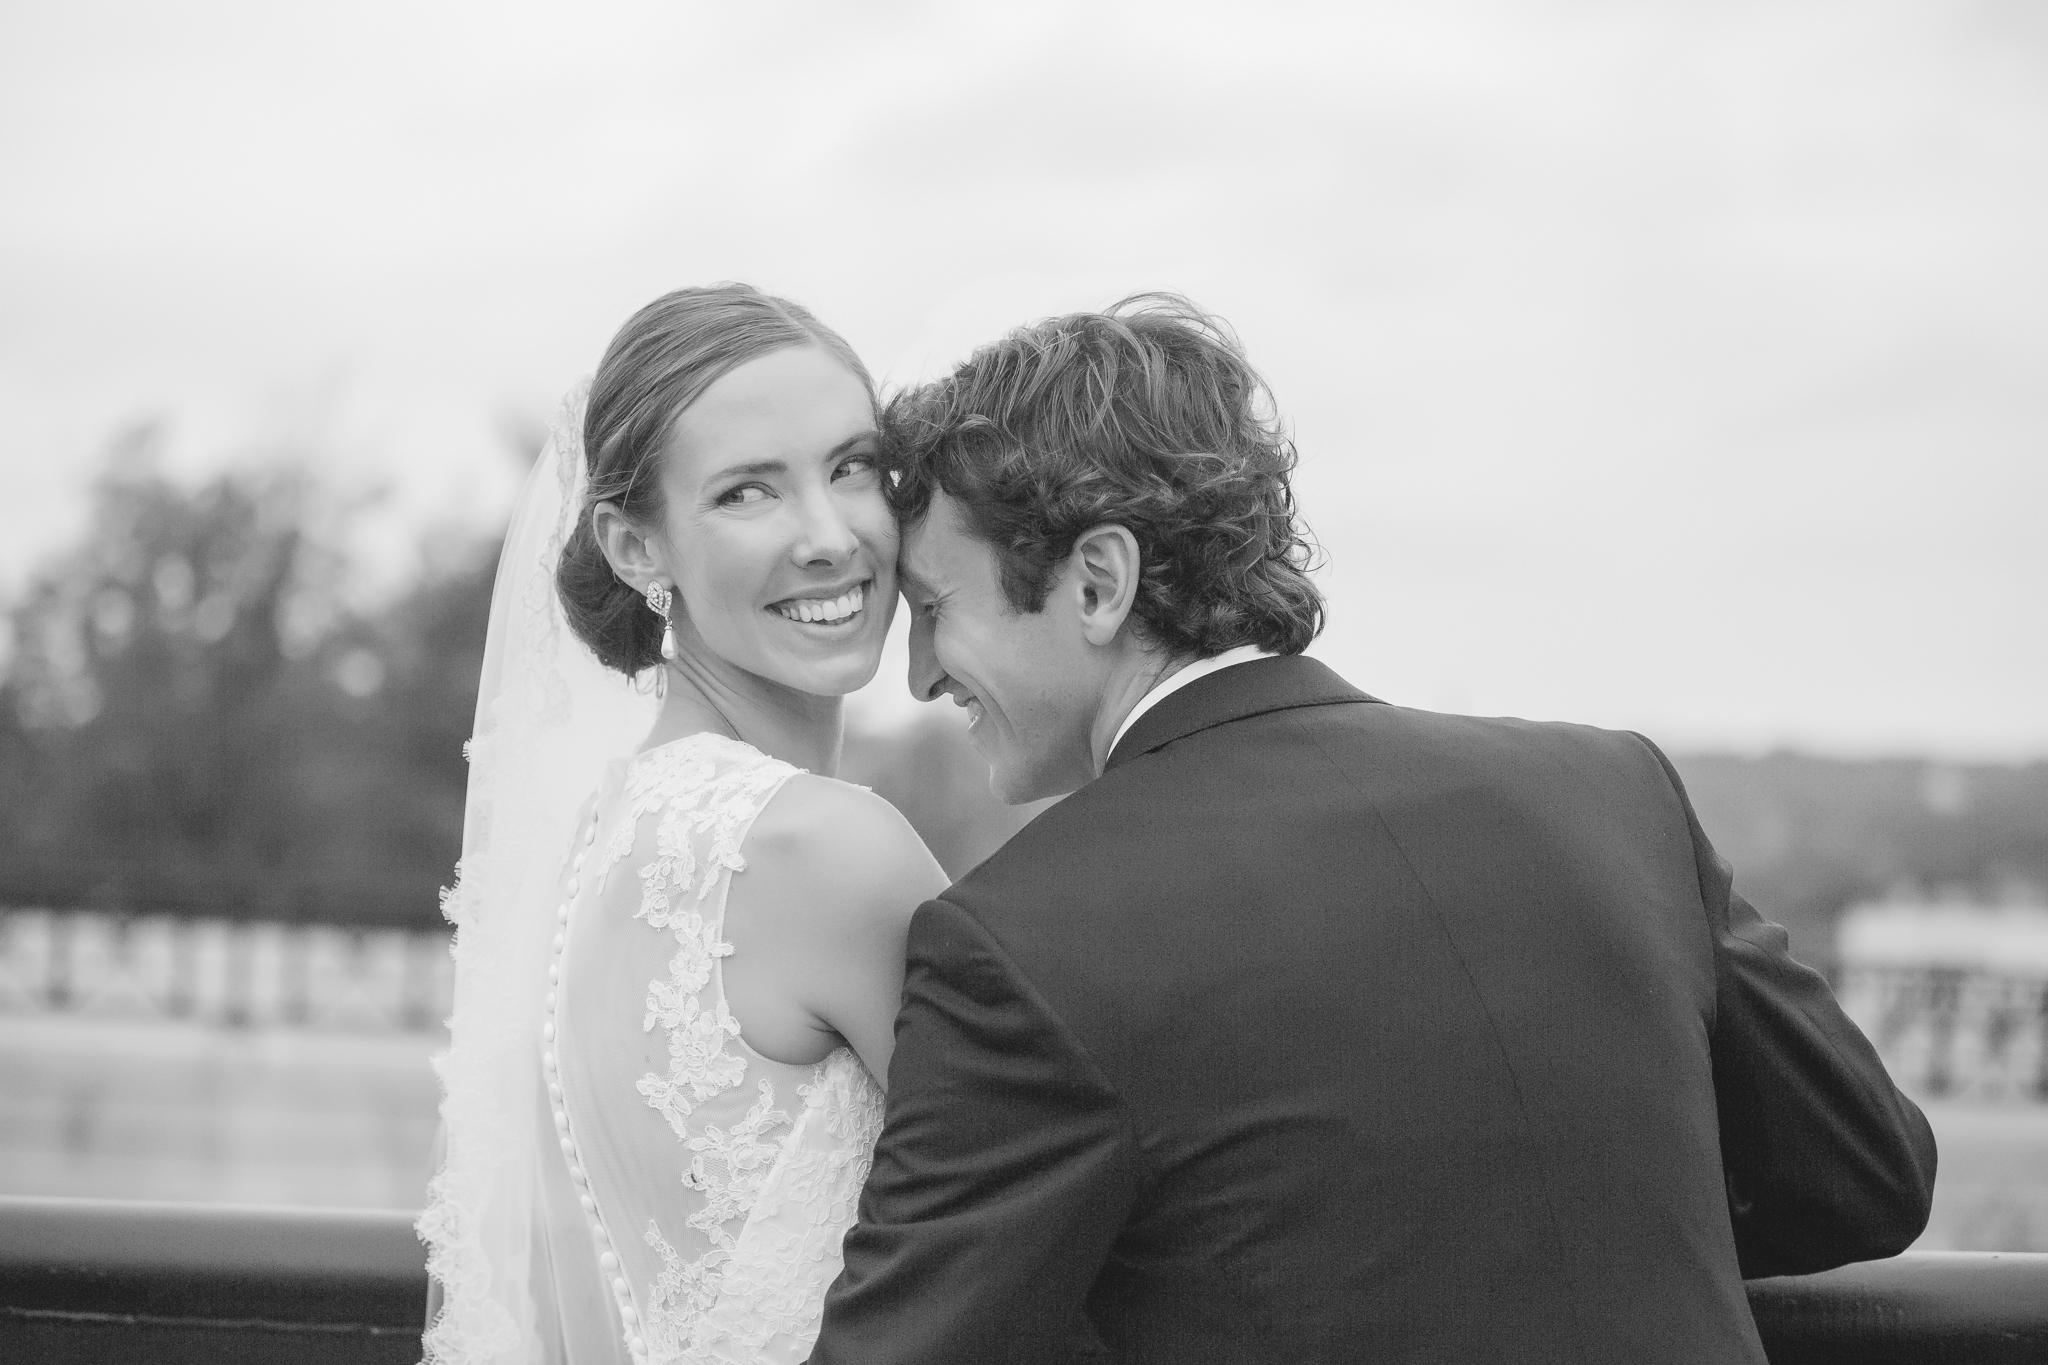 james j hill library wedding photography-20.jpg